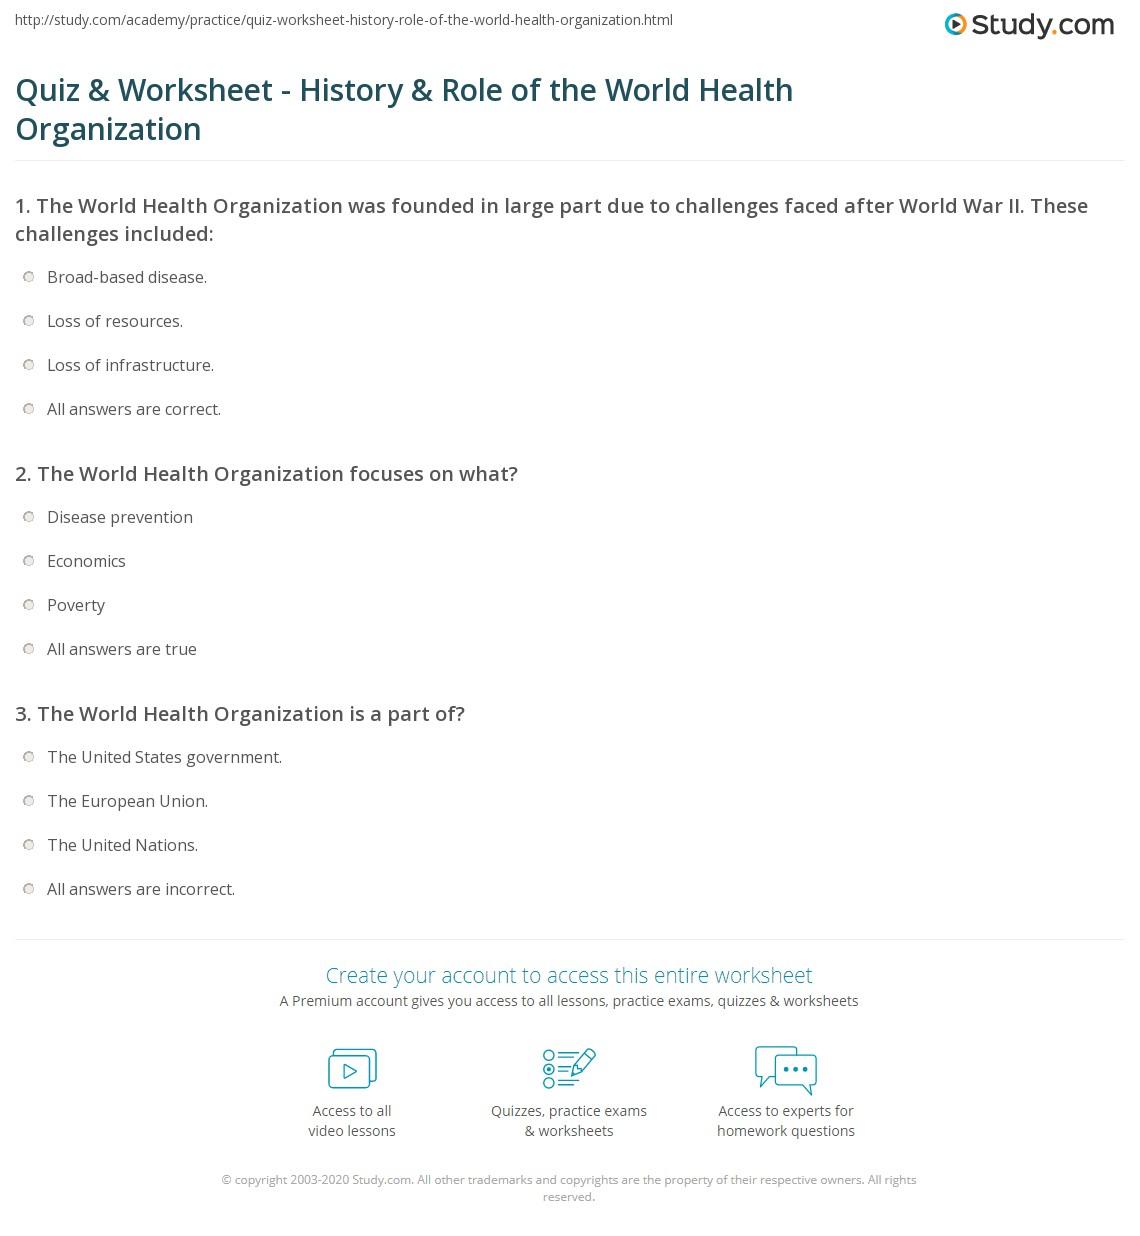 quiz & worksheet - history & role of the world health organization